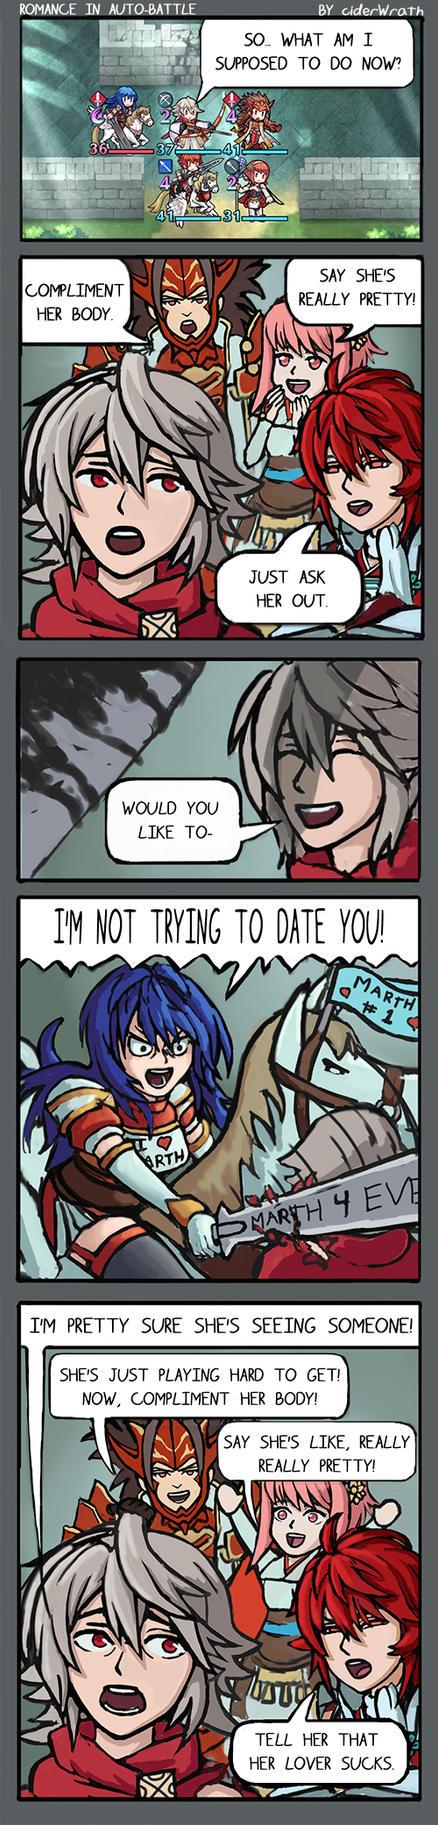 Romance in Auto-Battle by ciderWrath